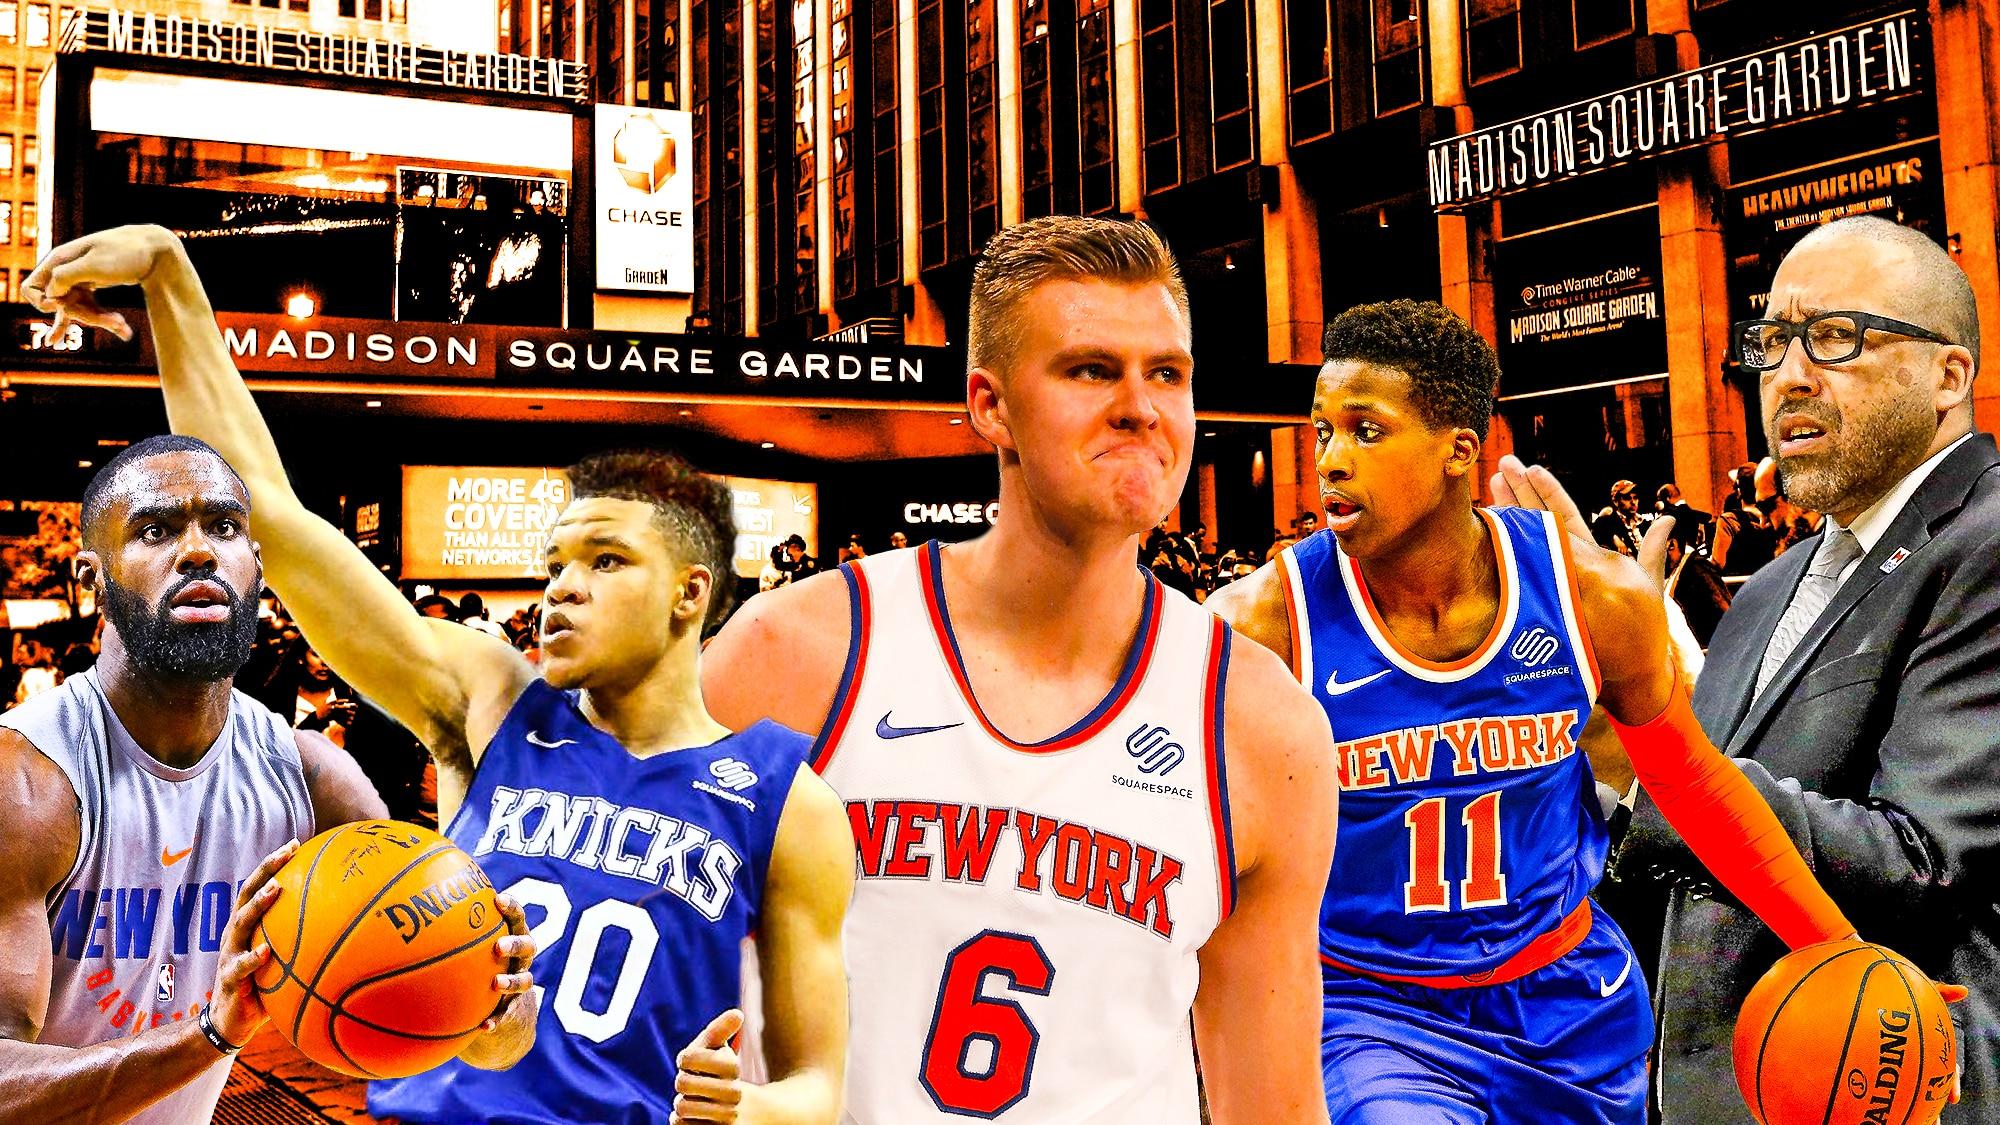 New York Knicks Schedule 2019 New York Knicks' plan to enter contention beyond 2018 2019